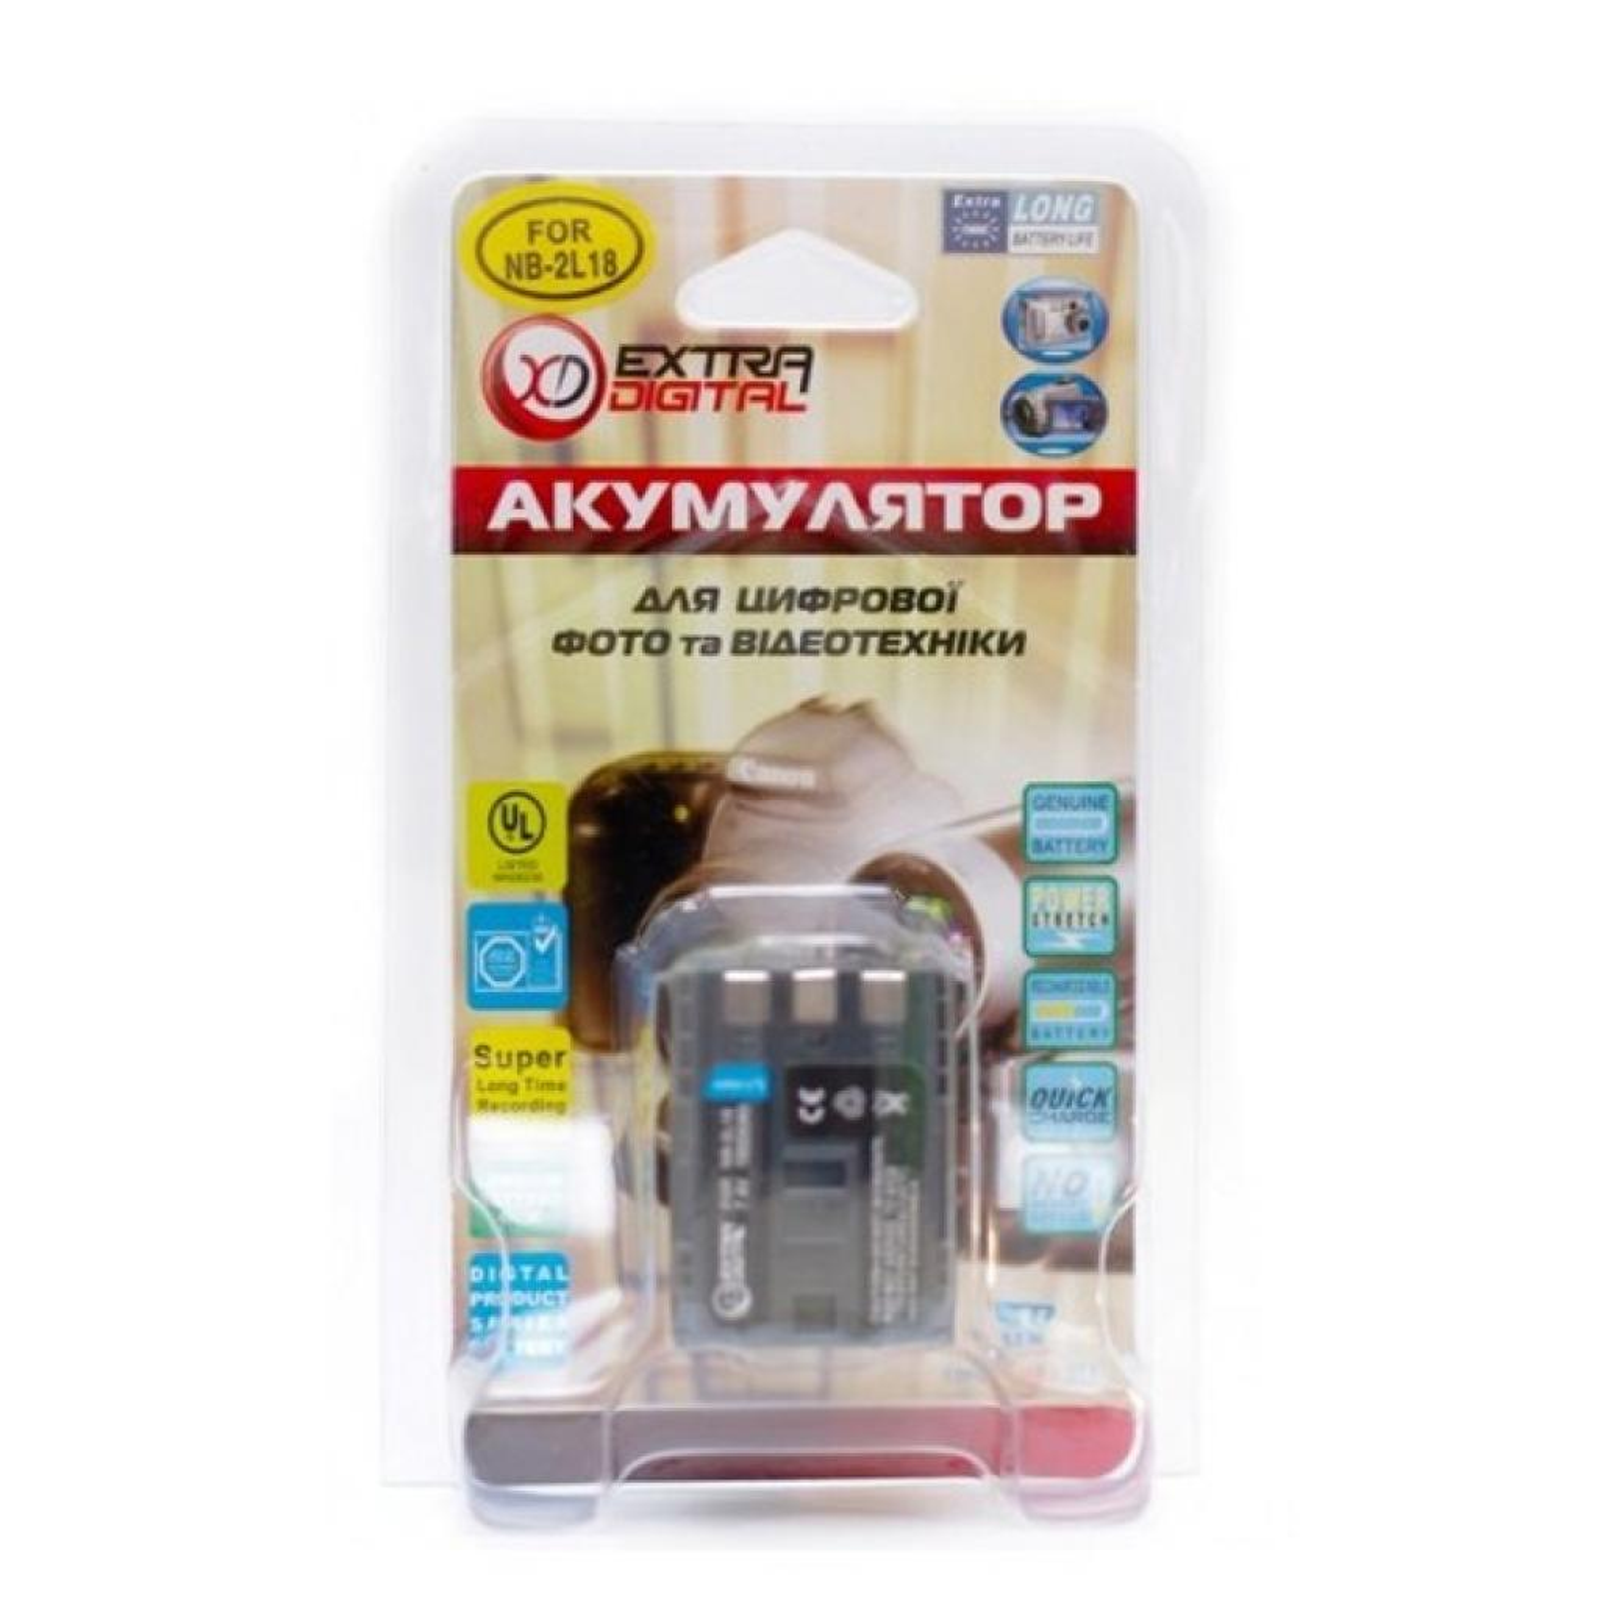 Аккумулятор к фото/видео EXTRADIGITAL Canon NB-2L18 (DV00DV1074) изображение 3